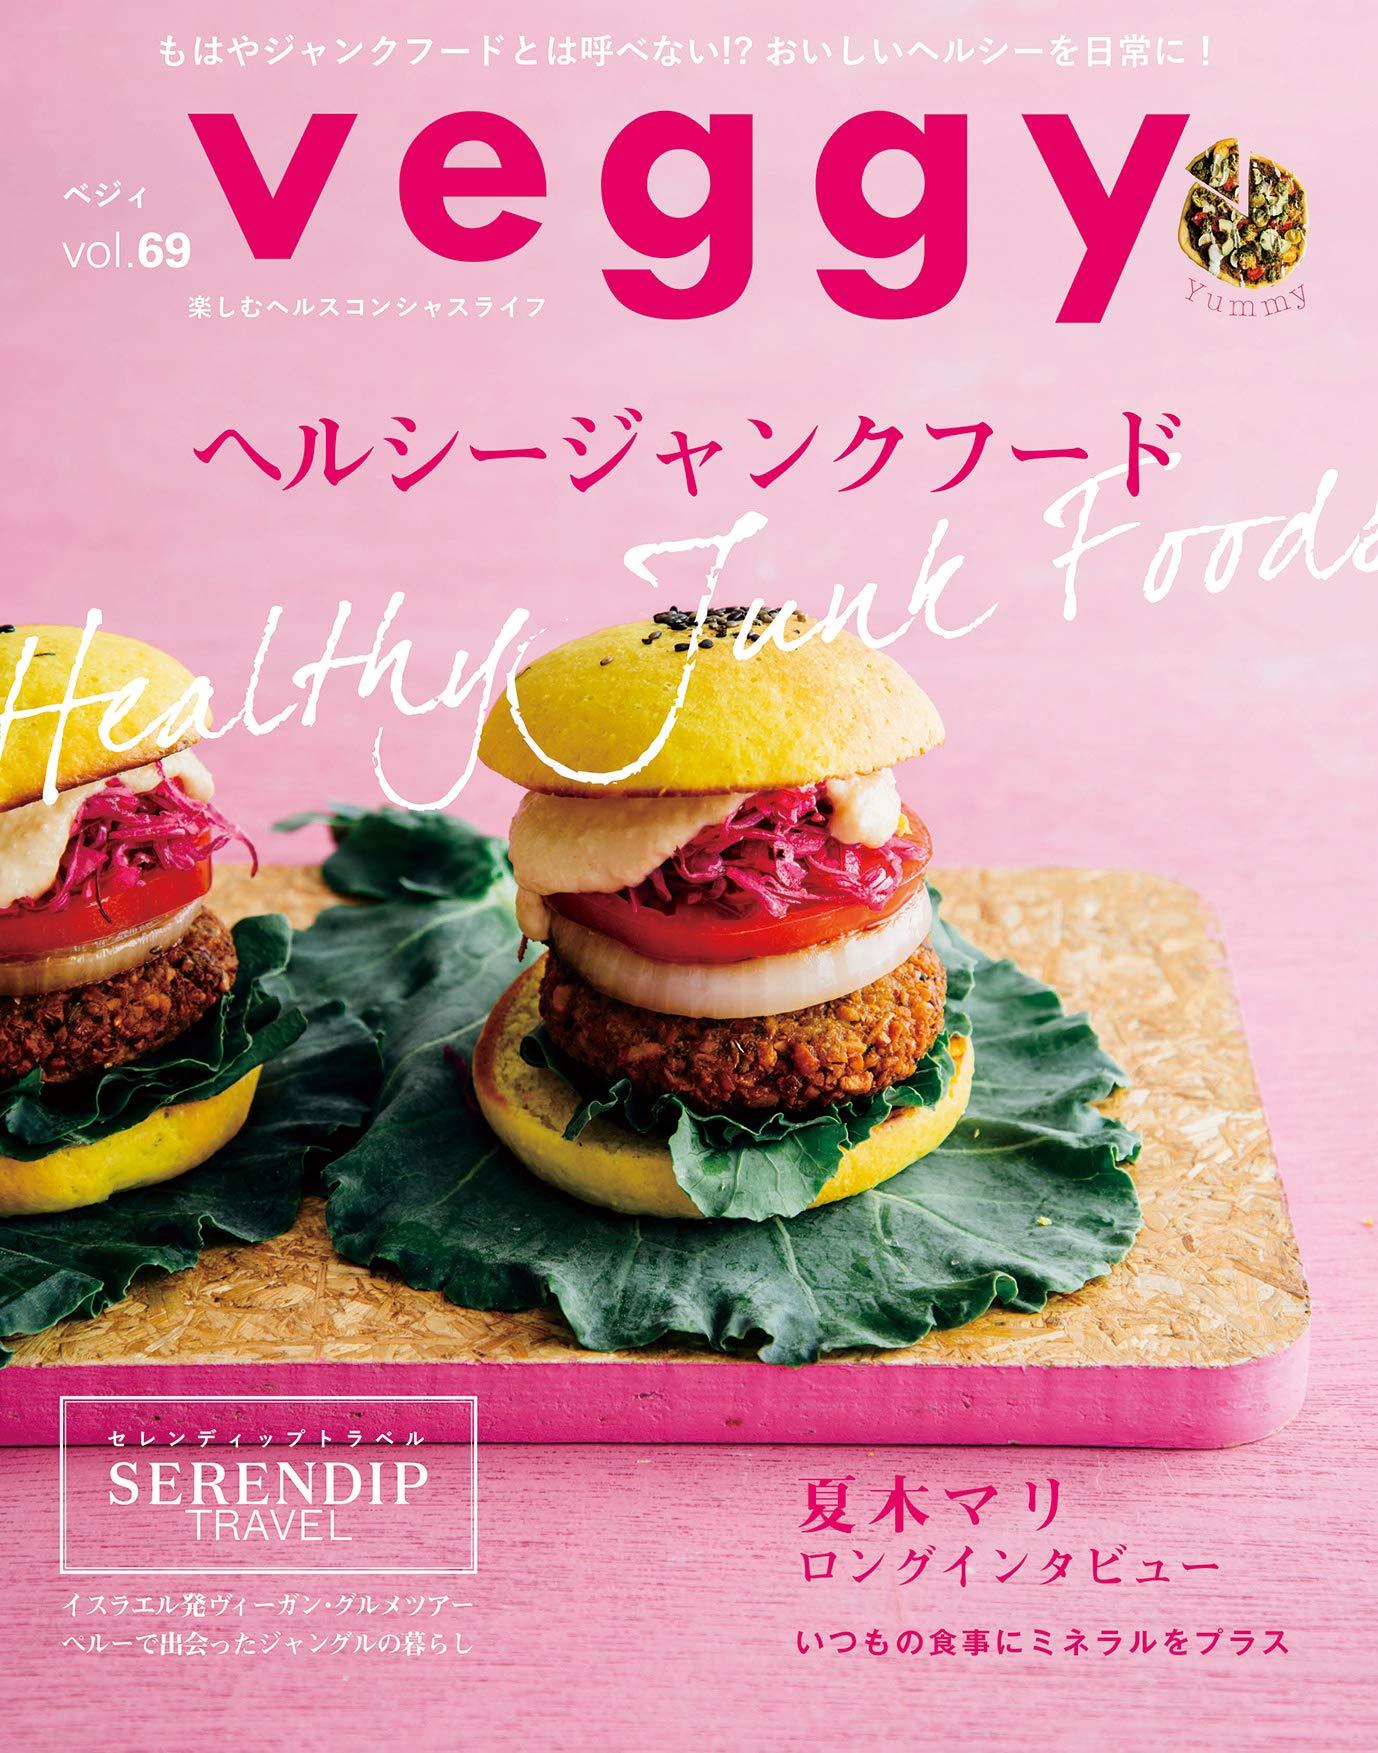 Veggy Vol.69(キラジェンヌ)